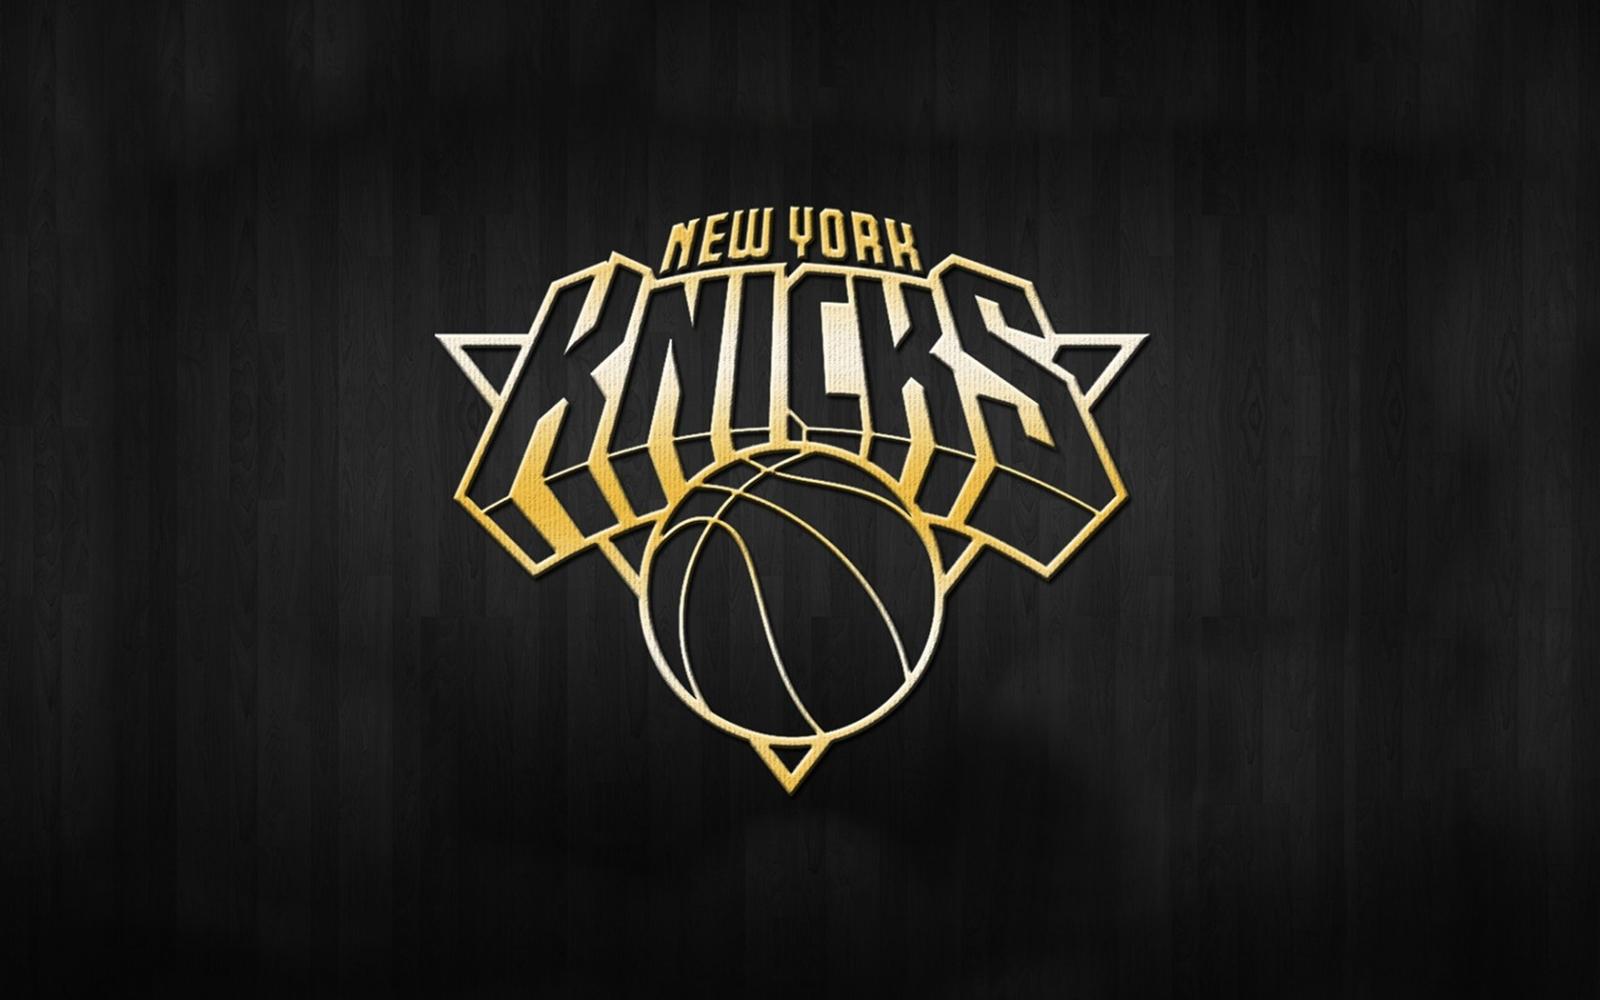 New York Knicks: New York Knicks Club Logos 2013